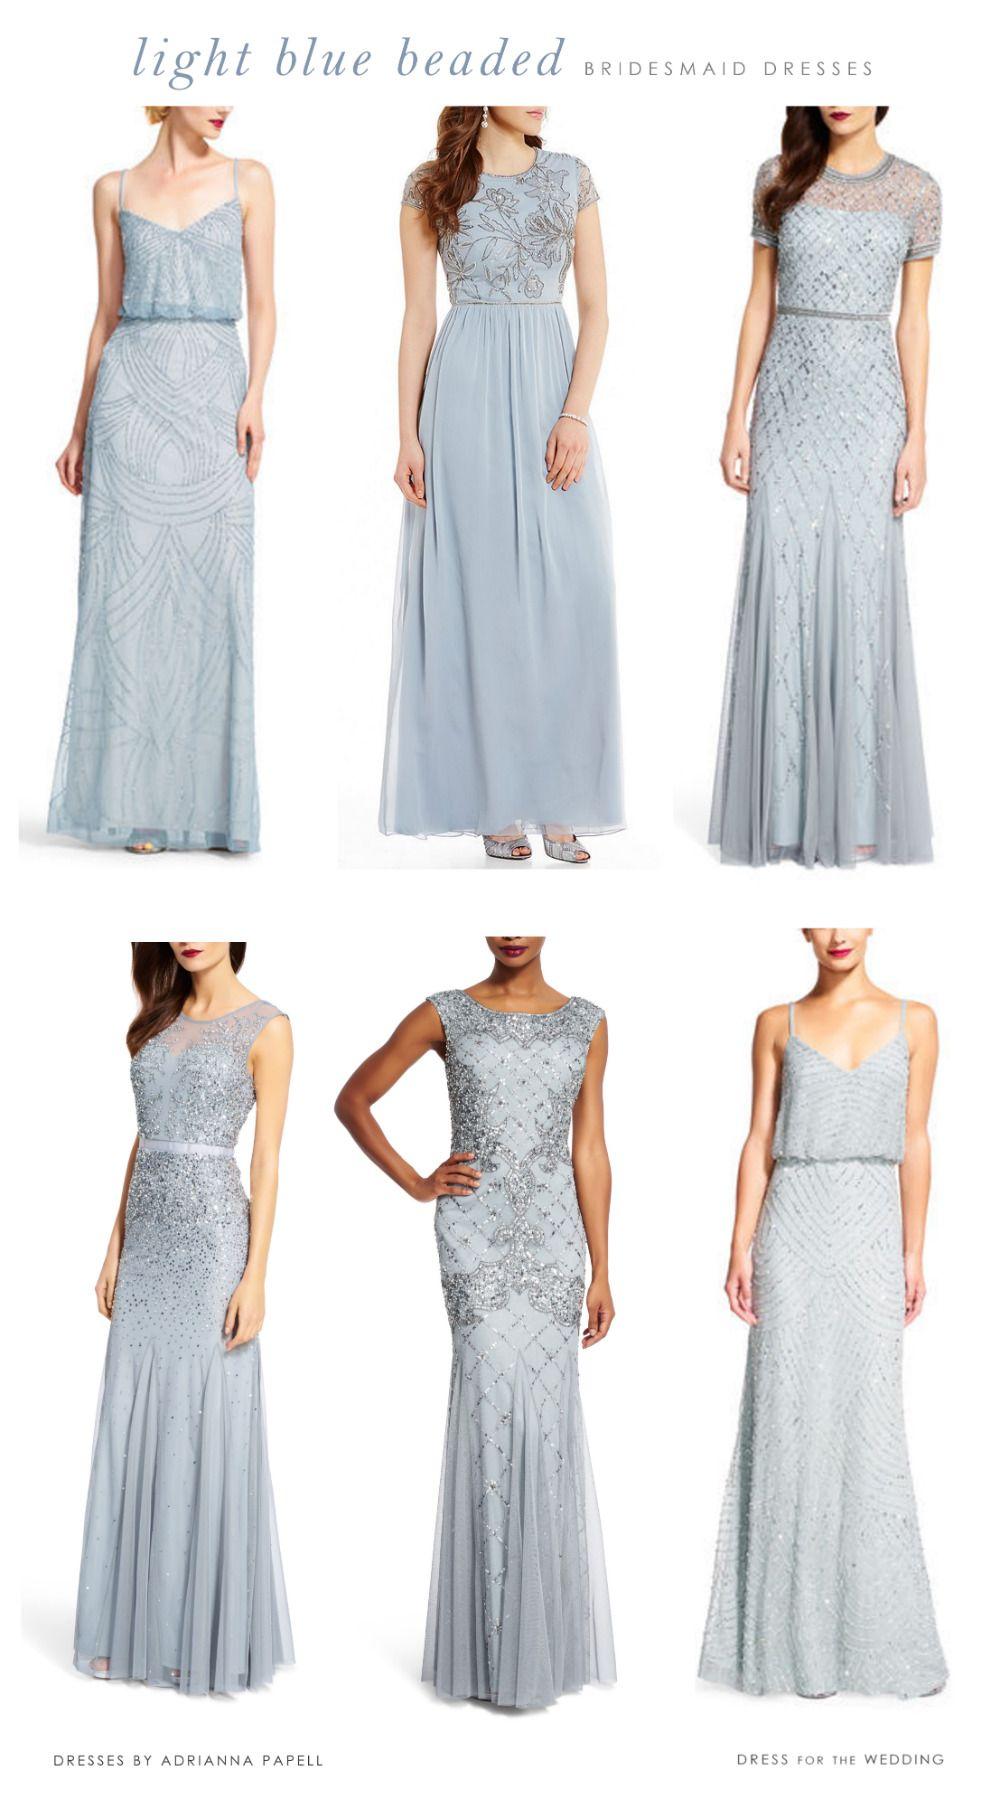 Light blue mix and match bridesmaid dresses bridesmaid dress ideas